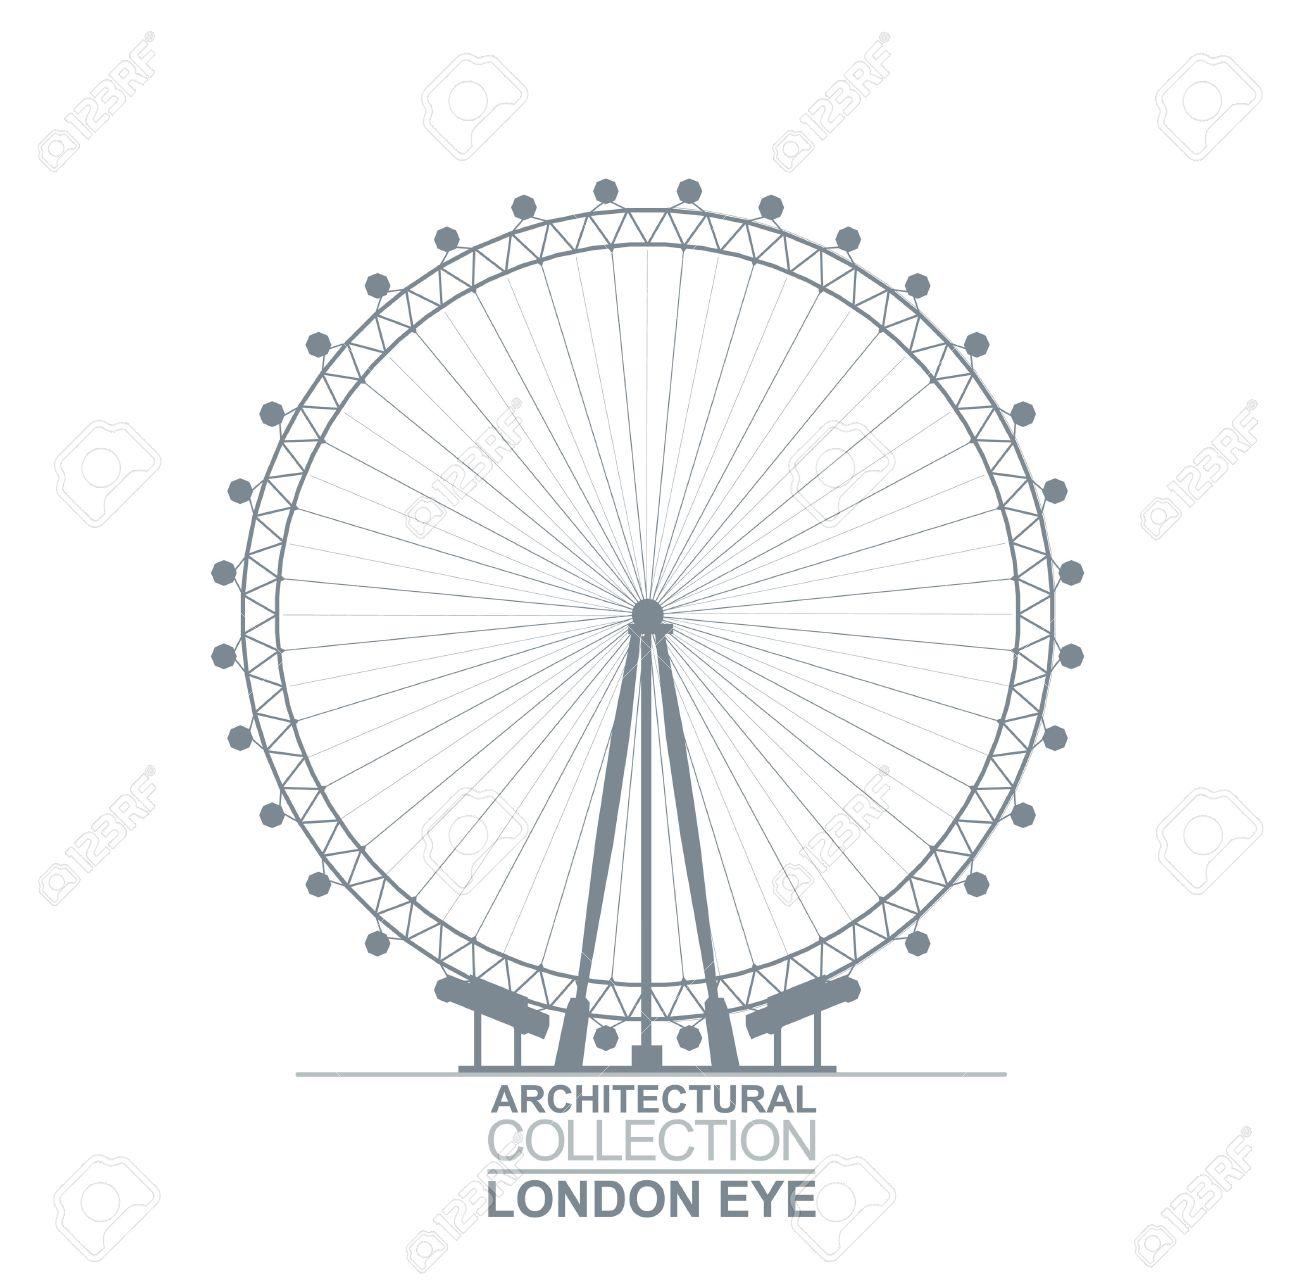 Detail Quality Architectural London Eye Wheel Silhouette - 53103261